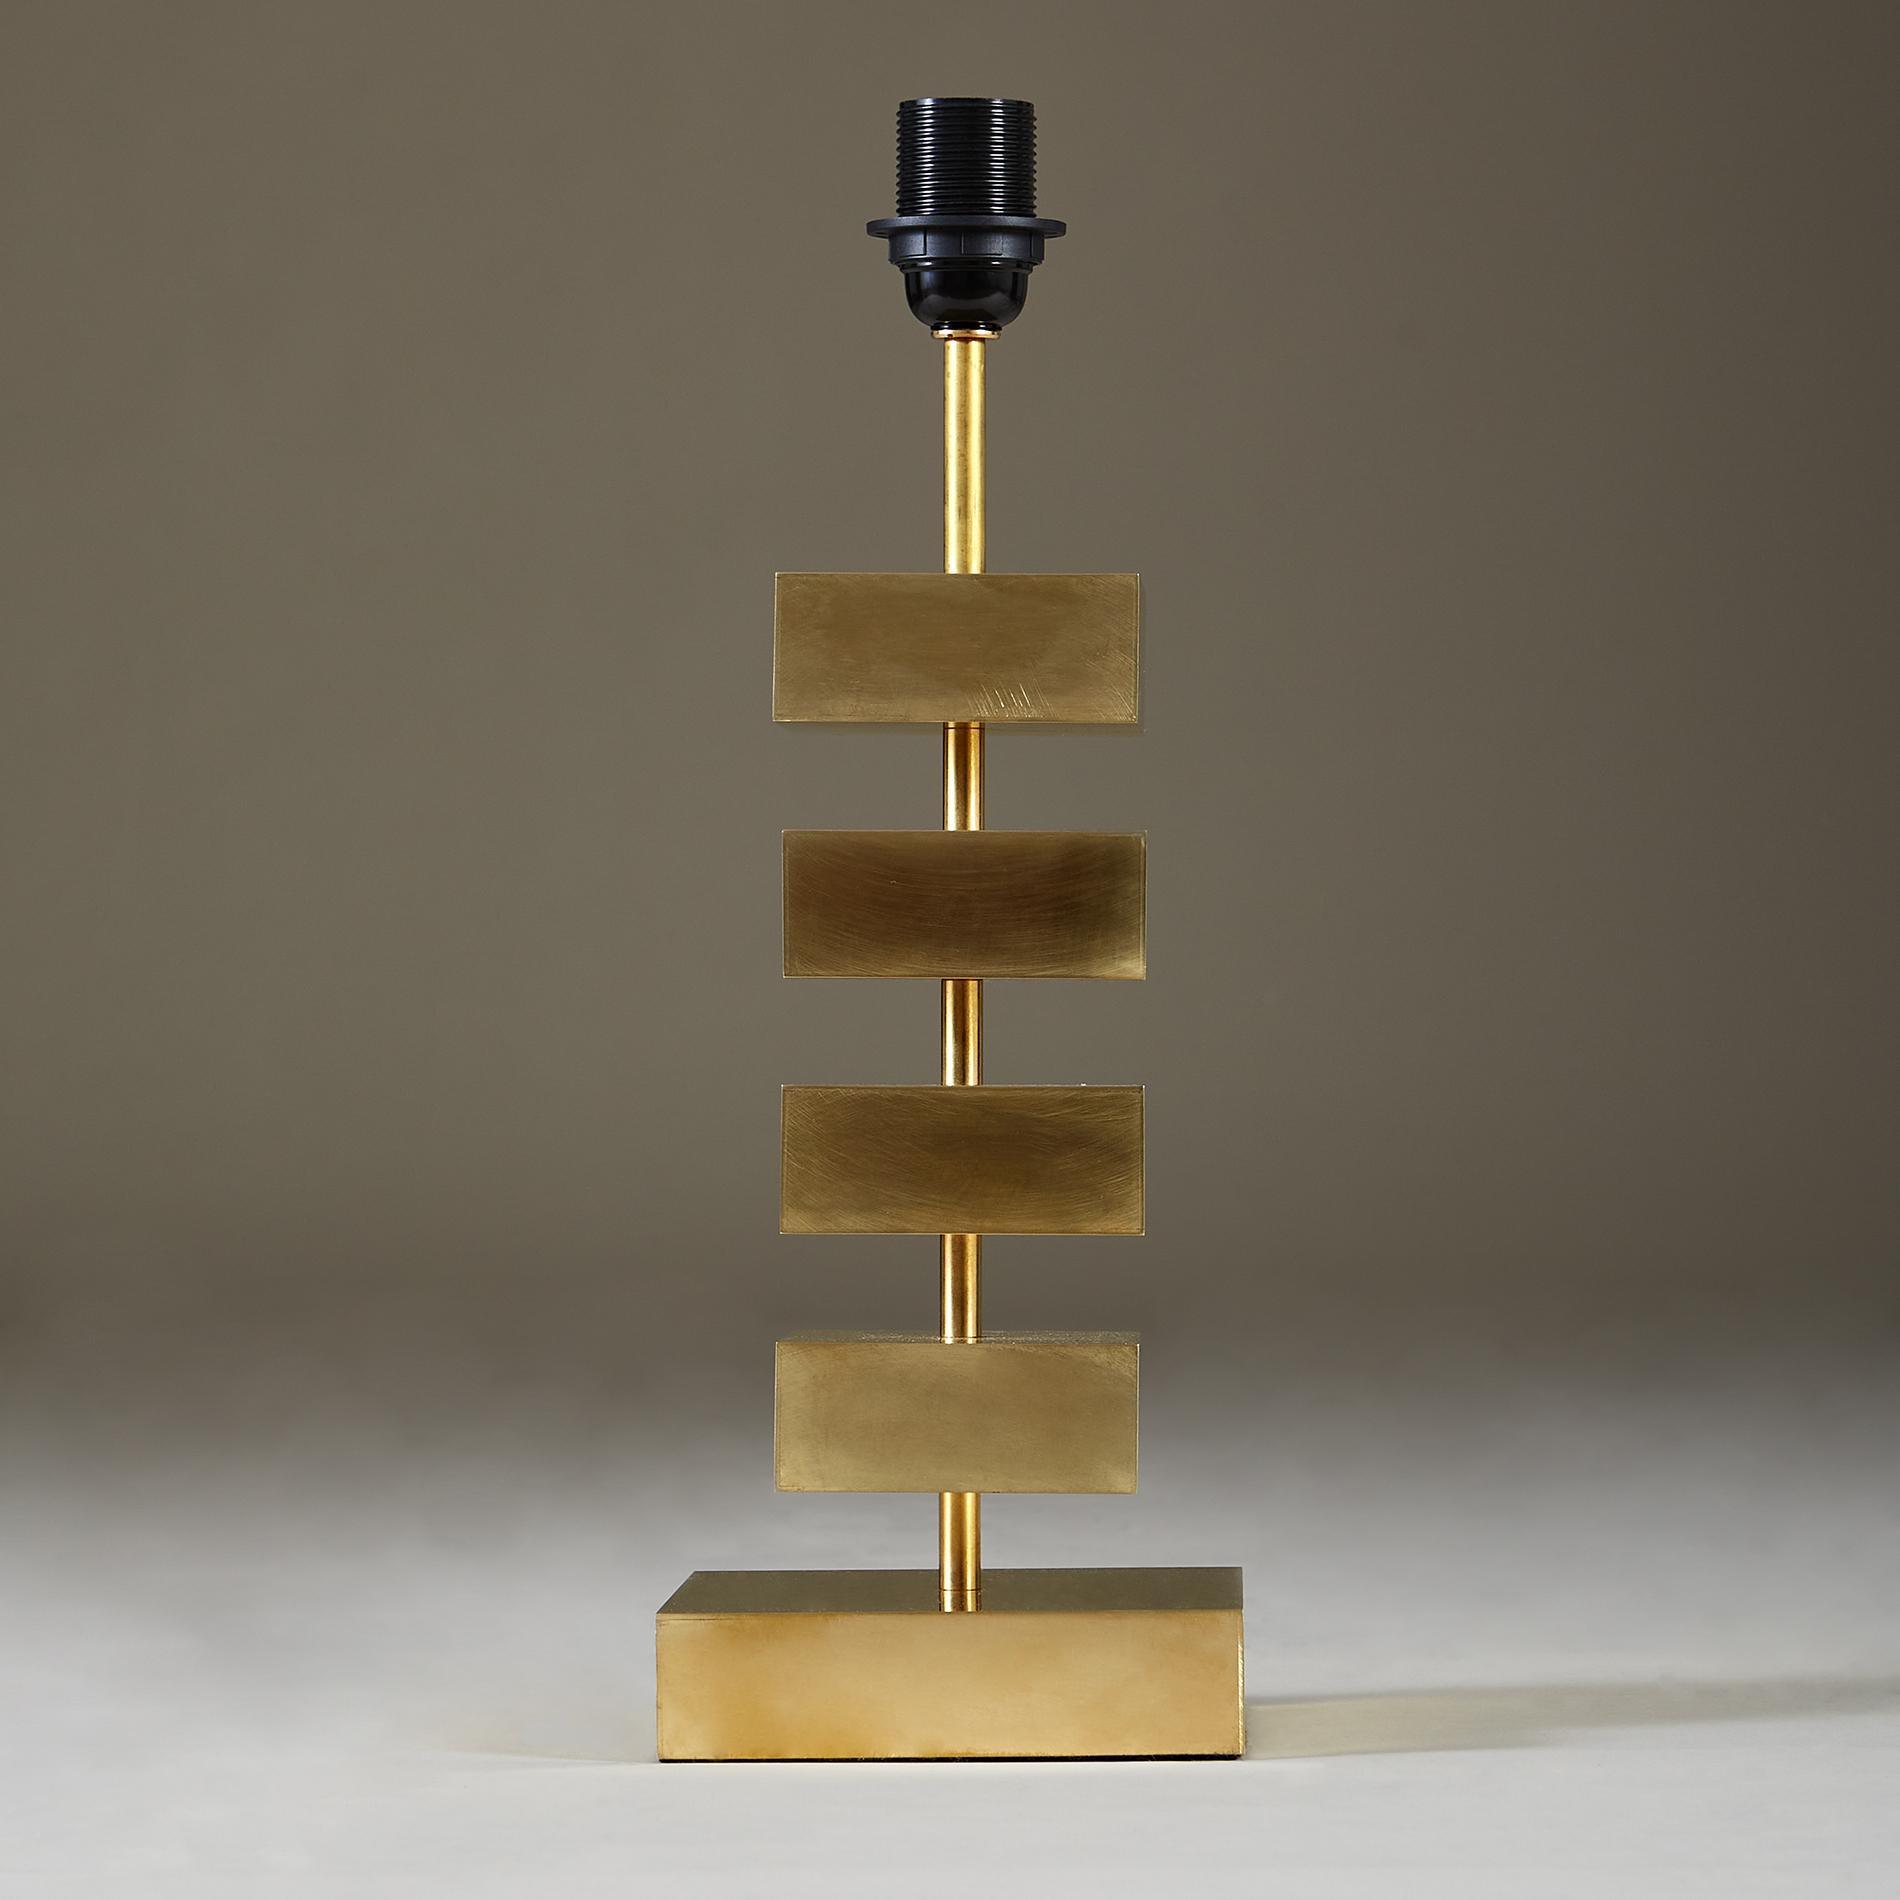 Luigi Stacked Table Lamps 20210225 Valerie Wade 2 203 V1